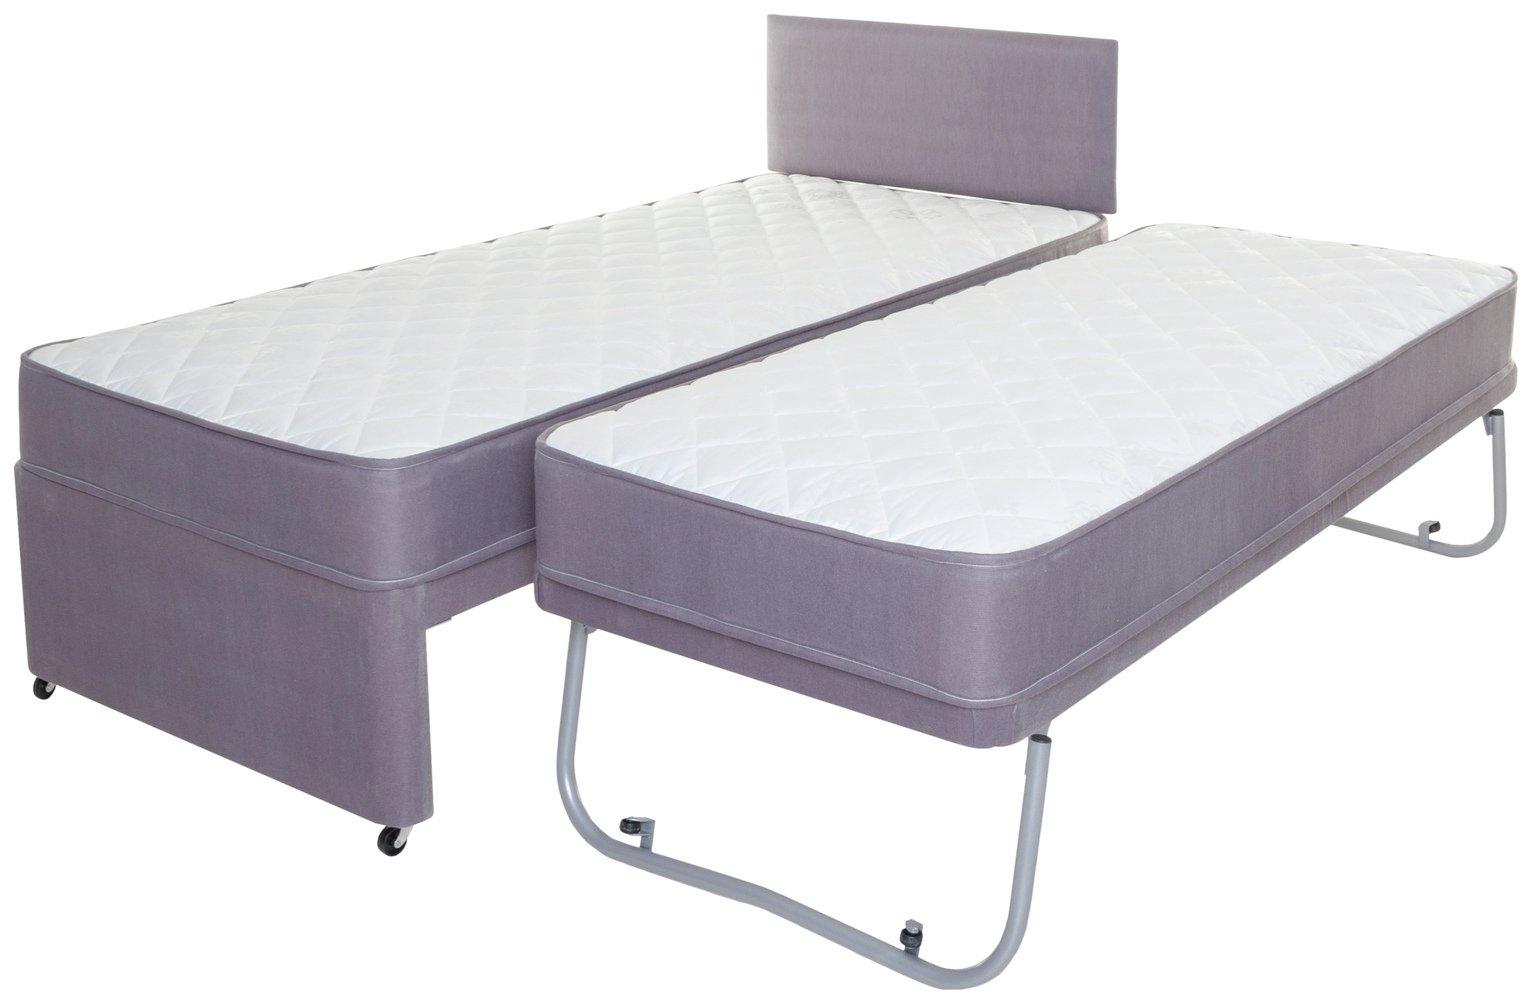 Image of Airsprung Newington Folding Guest Bed & Mattress - Single